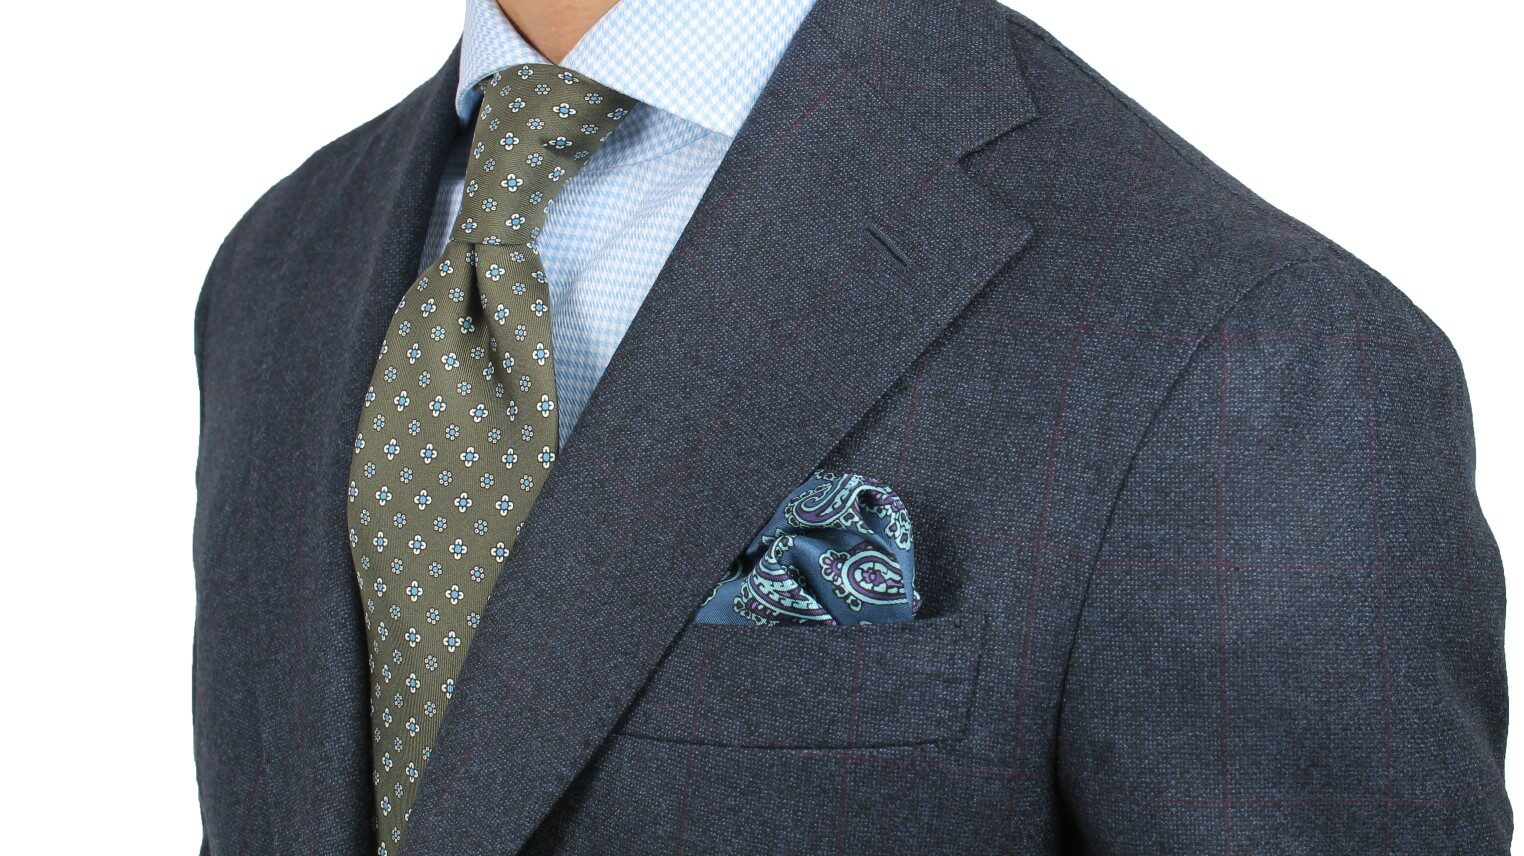 Cordone1956 flannel suit handmade